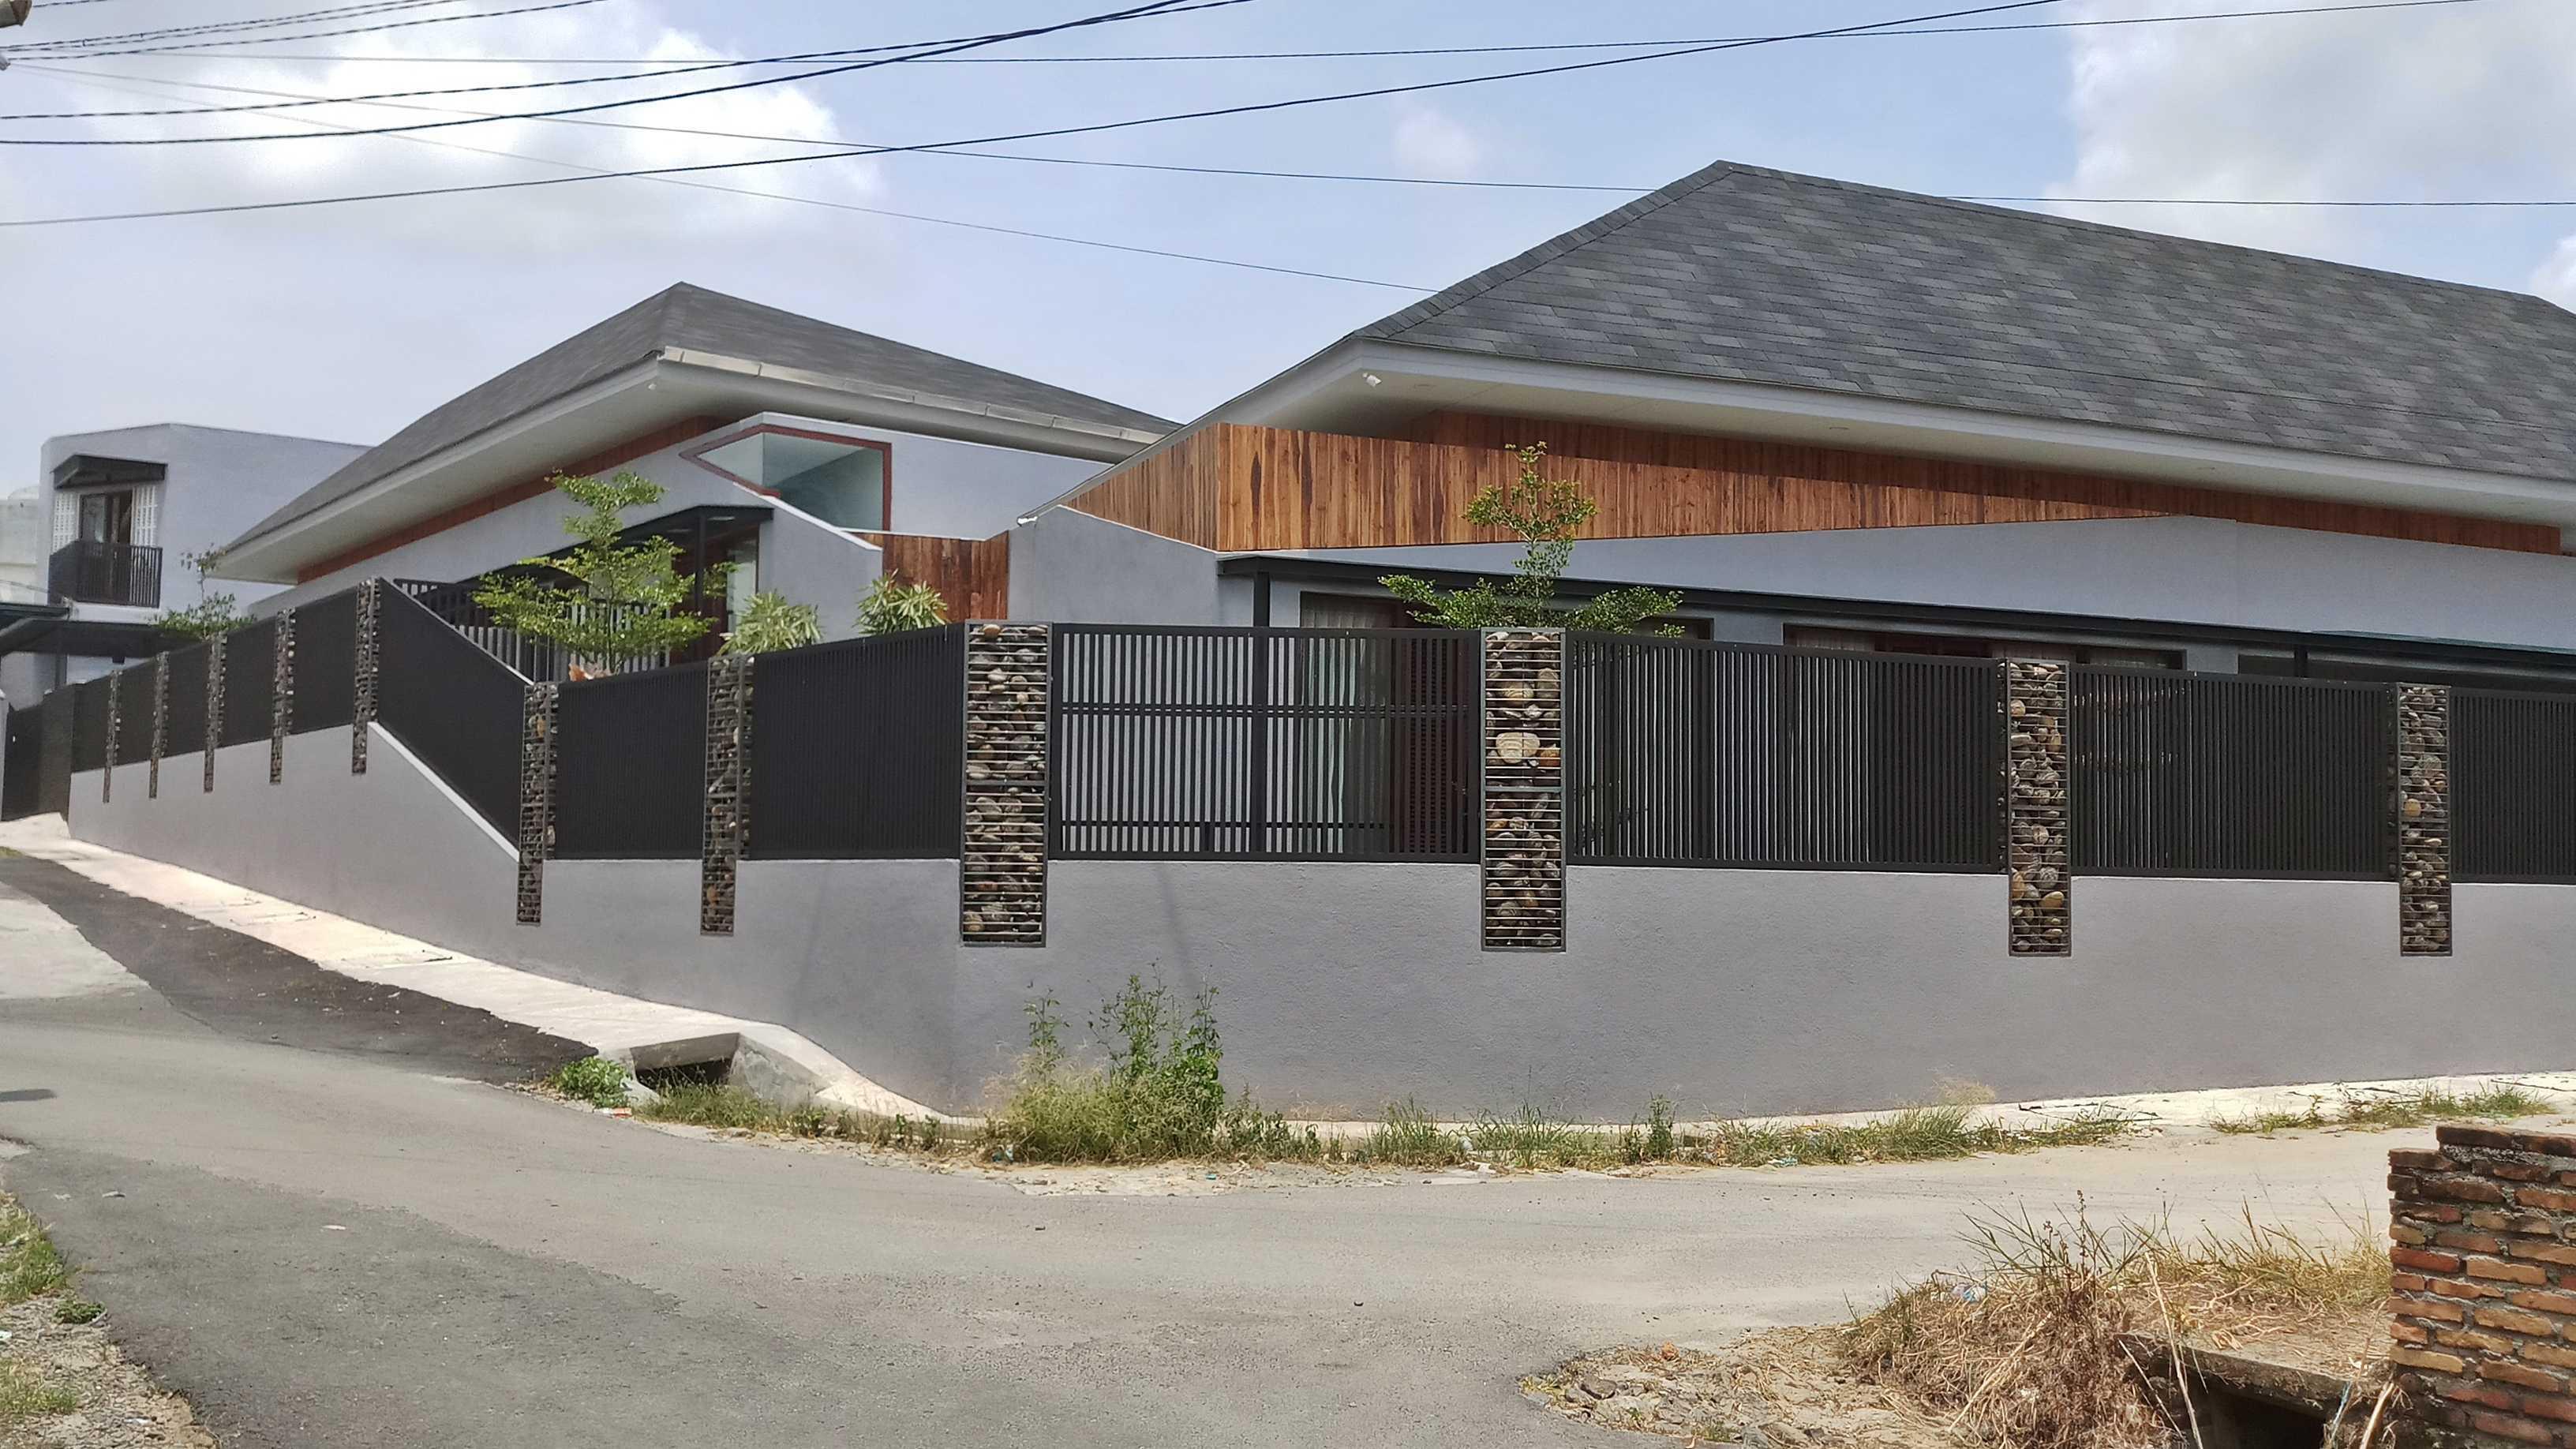 Bd Studio Sh Villa House Pematang Siantar, Kota Pematang Siantar, Sumatera Utara, Indonesia Pematang Siantar, Kota Pematang Siantar, Sumatera Utara, Indonesia Bd-Studio-Sh-Villa-House   74066